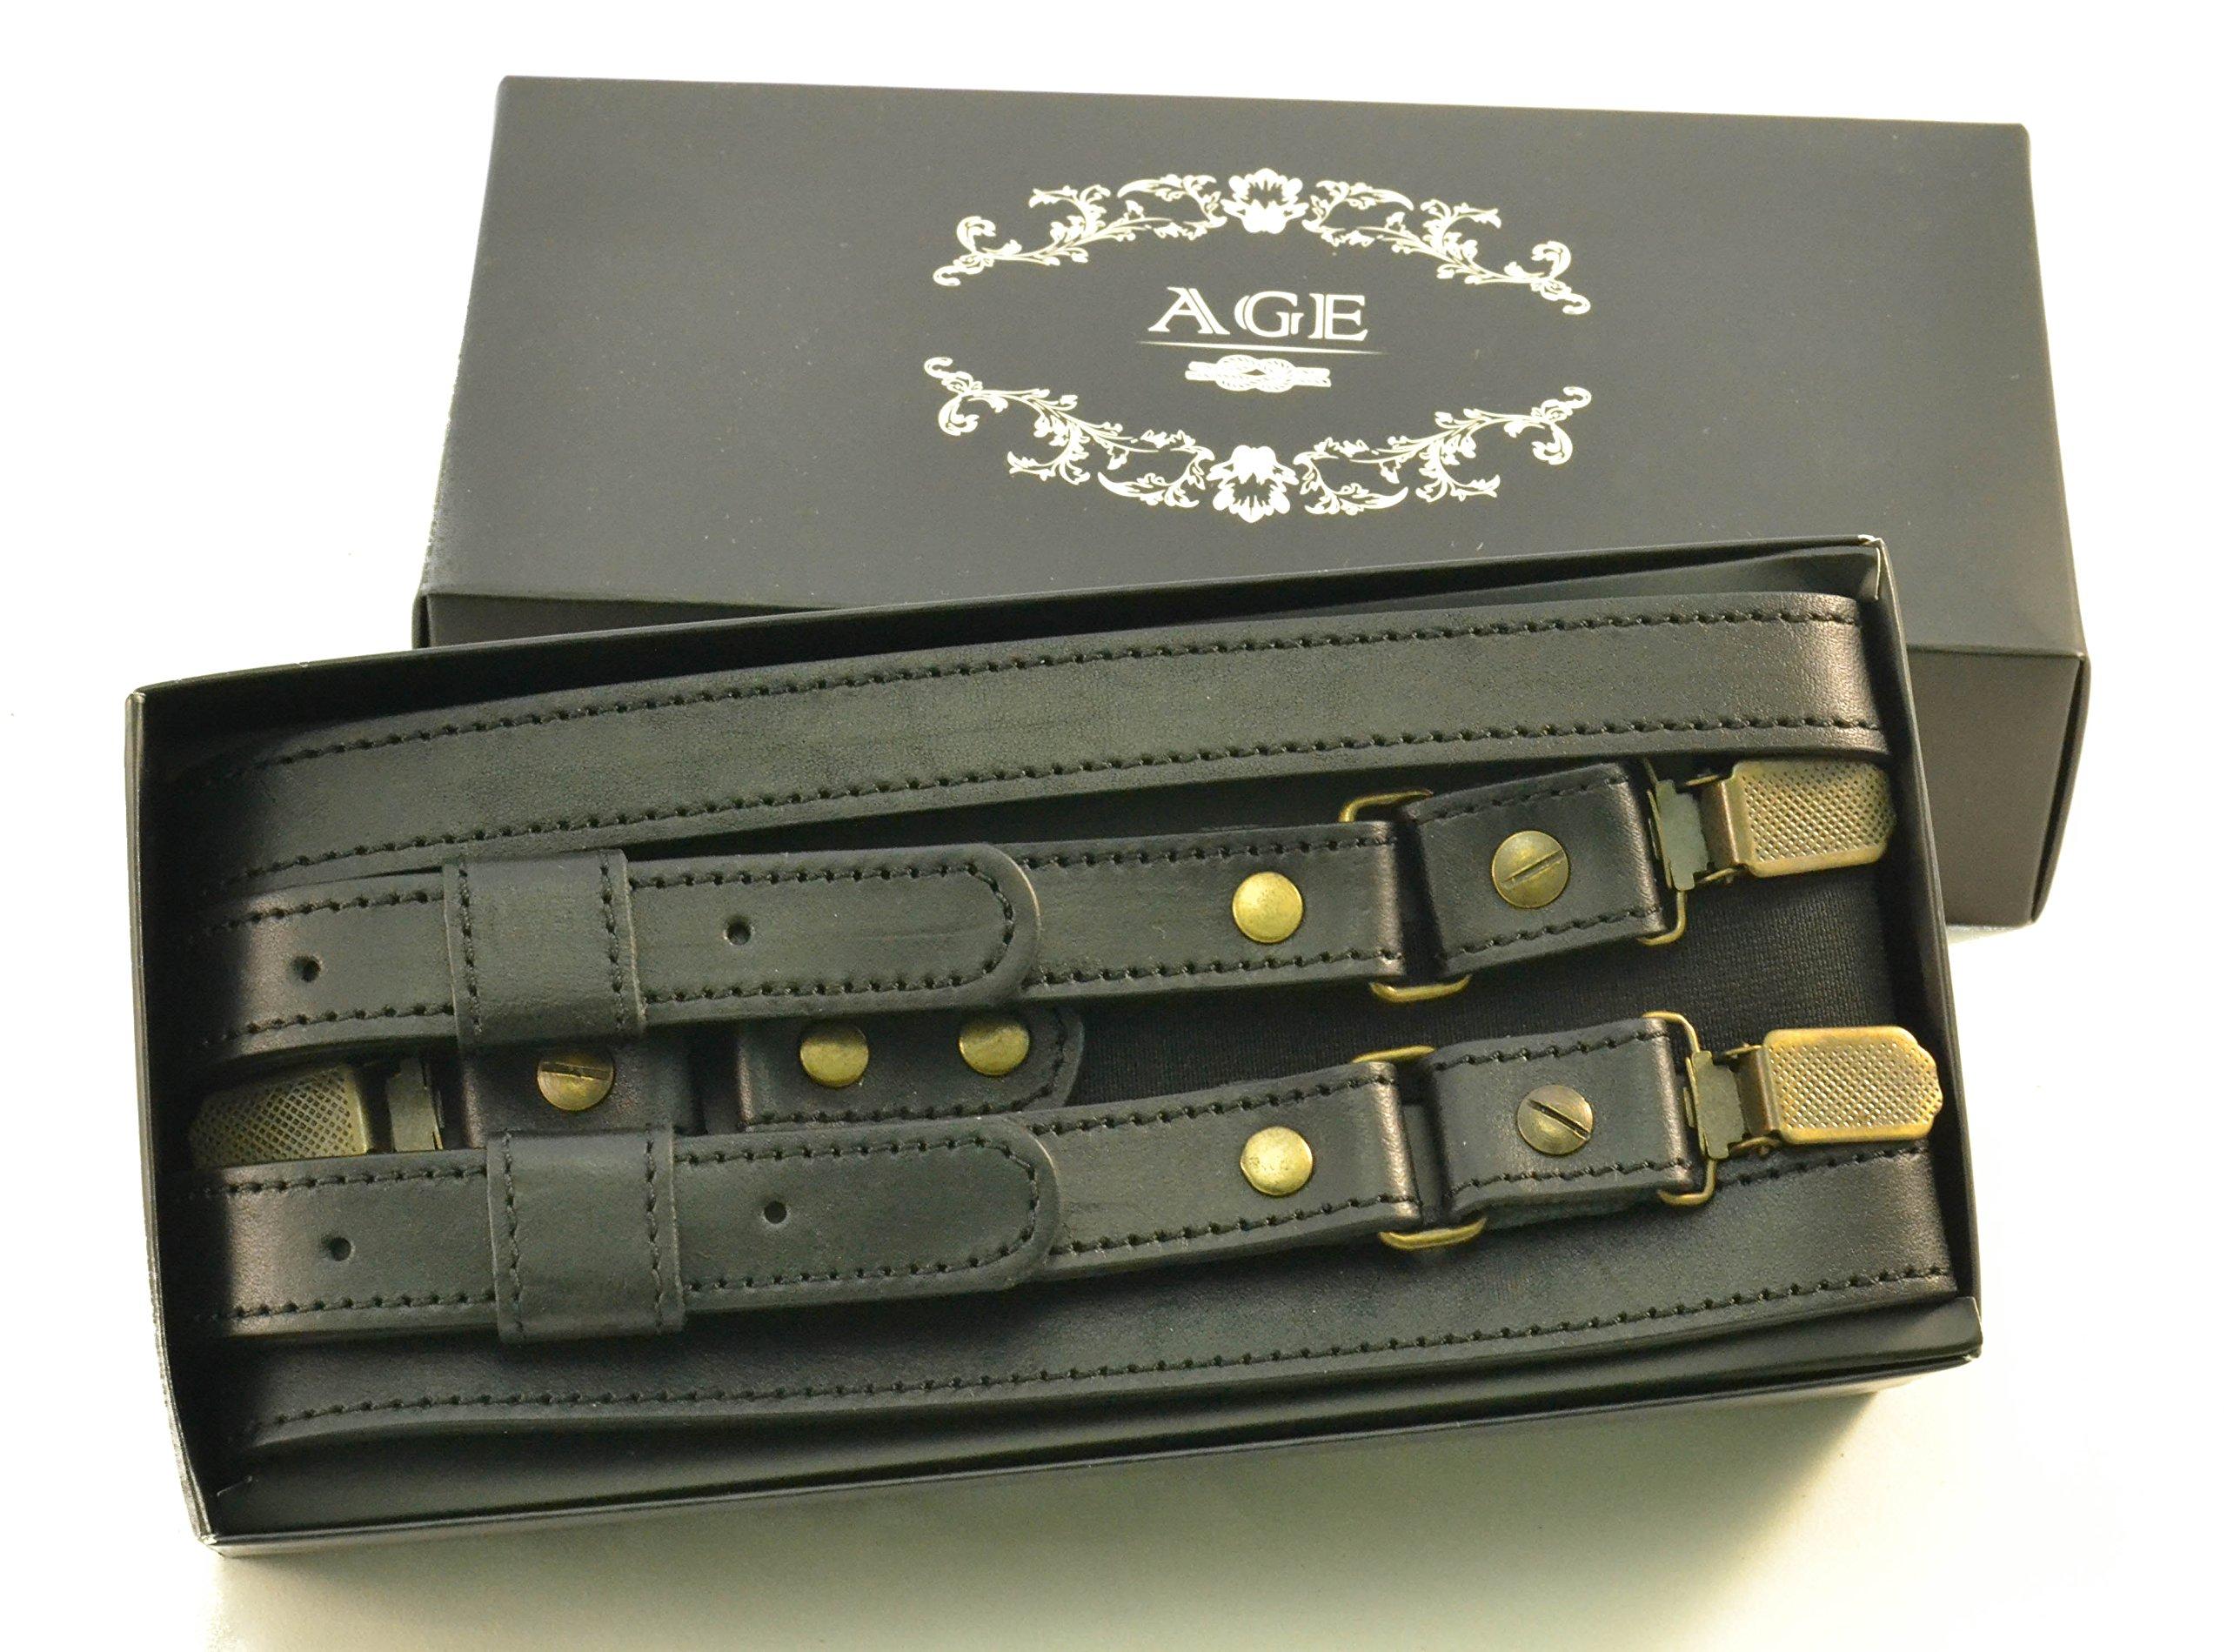 Suspenders for men, double clip suspenders, men suspenders braces Y-back by AGE (Image #8)